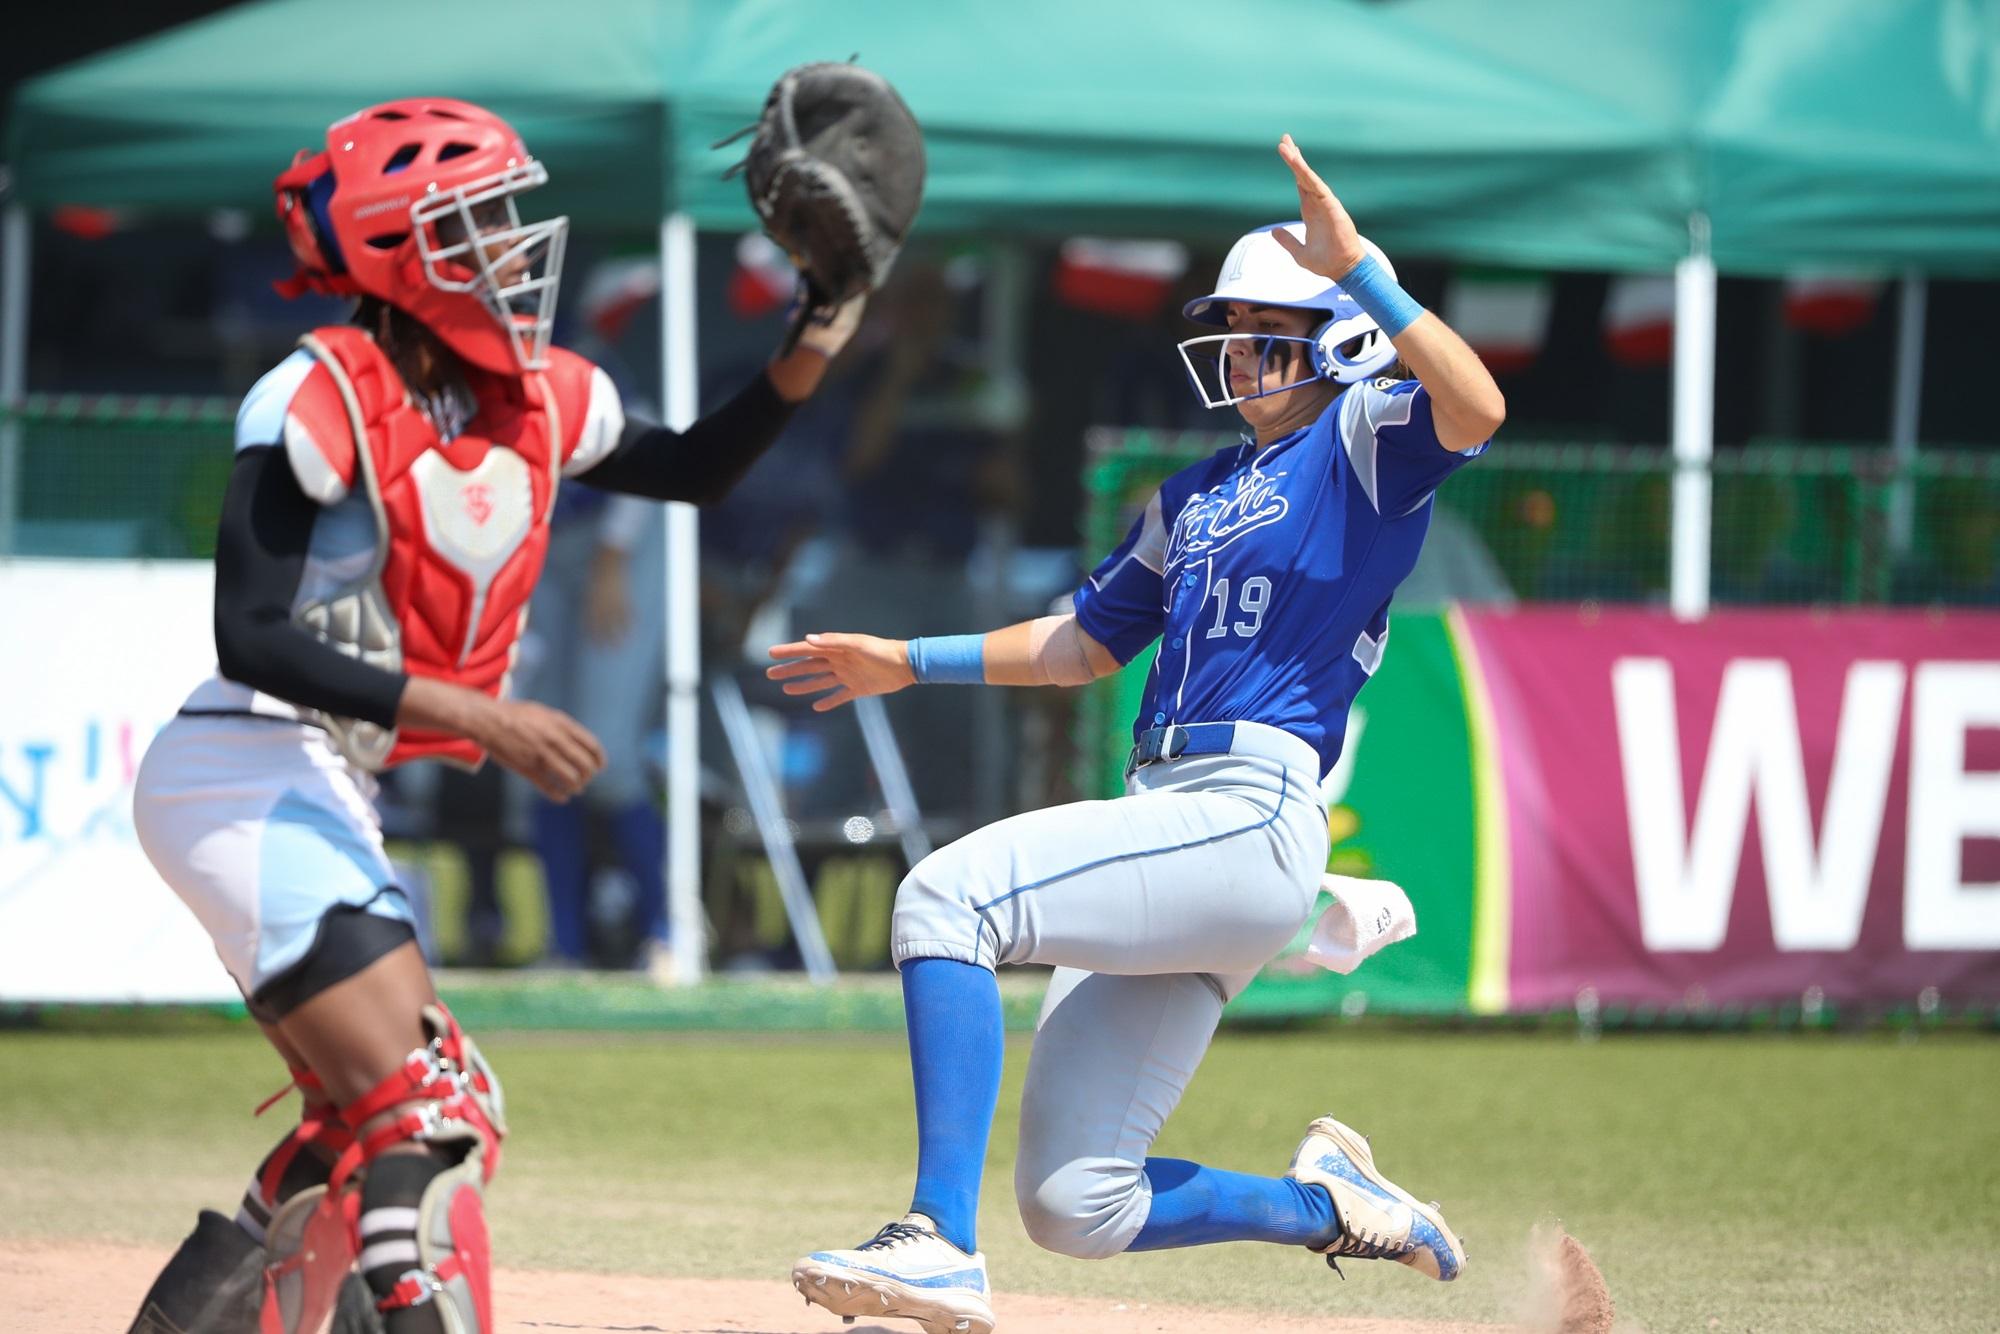 Marta Gasparotto scores for Italy against Botswana